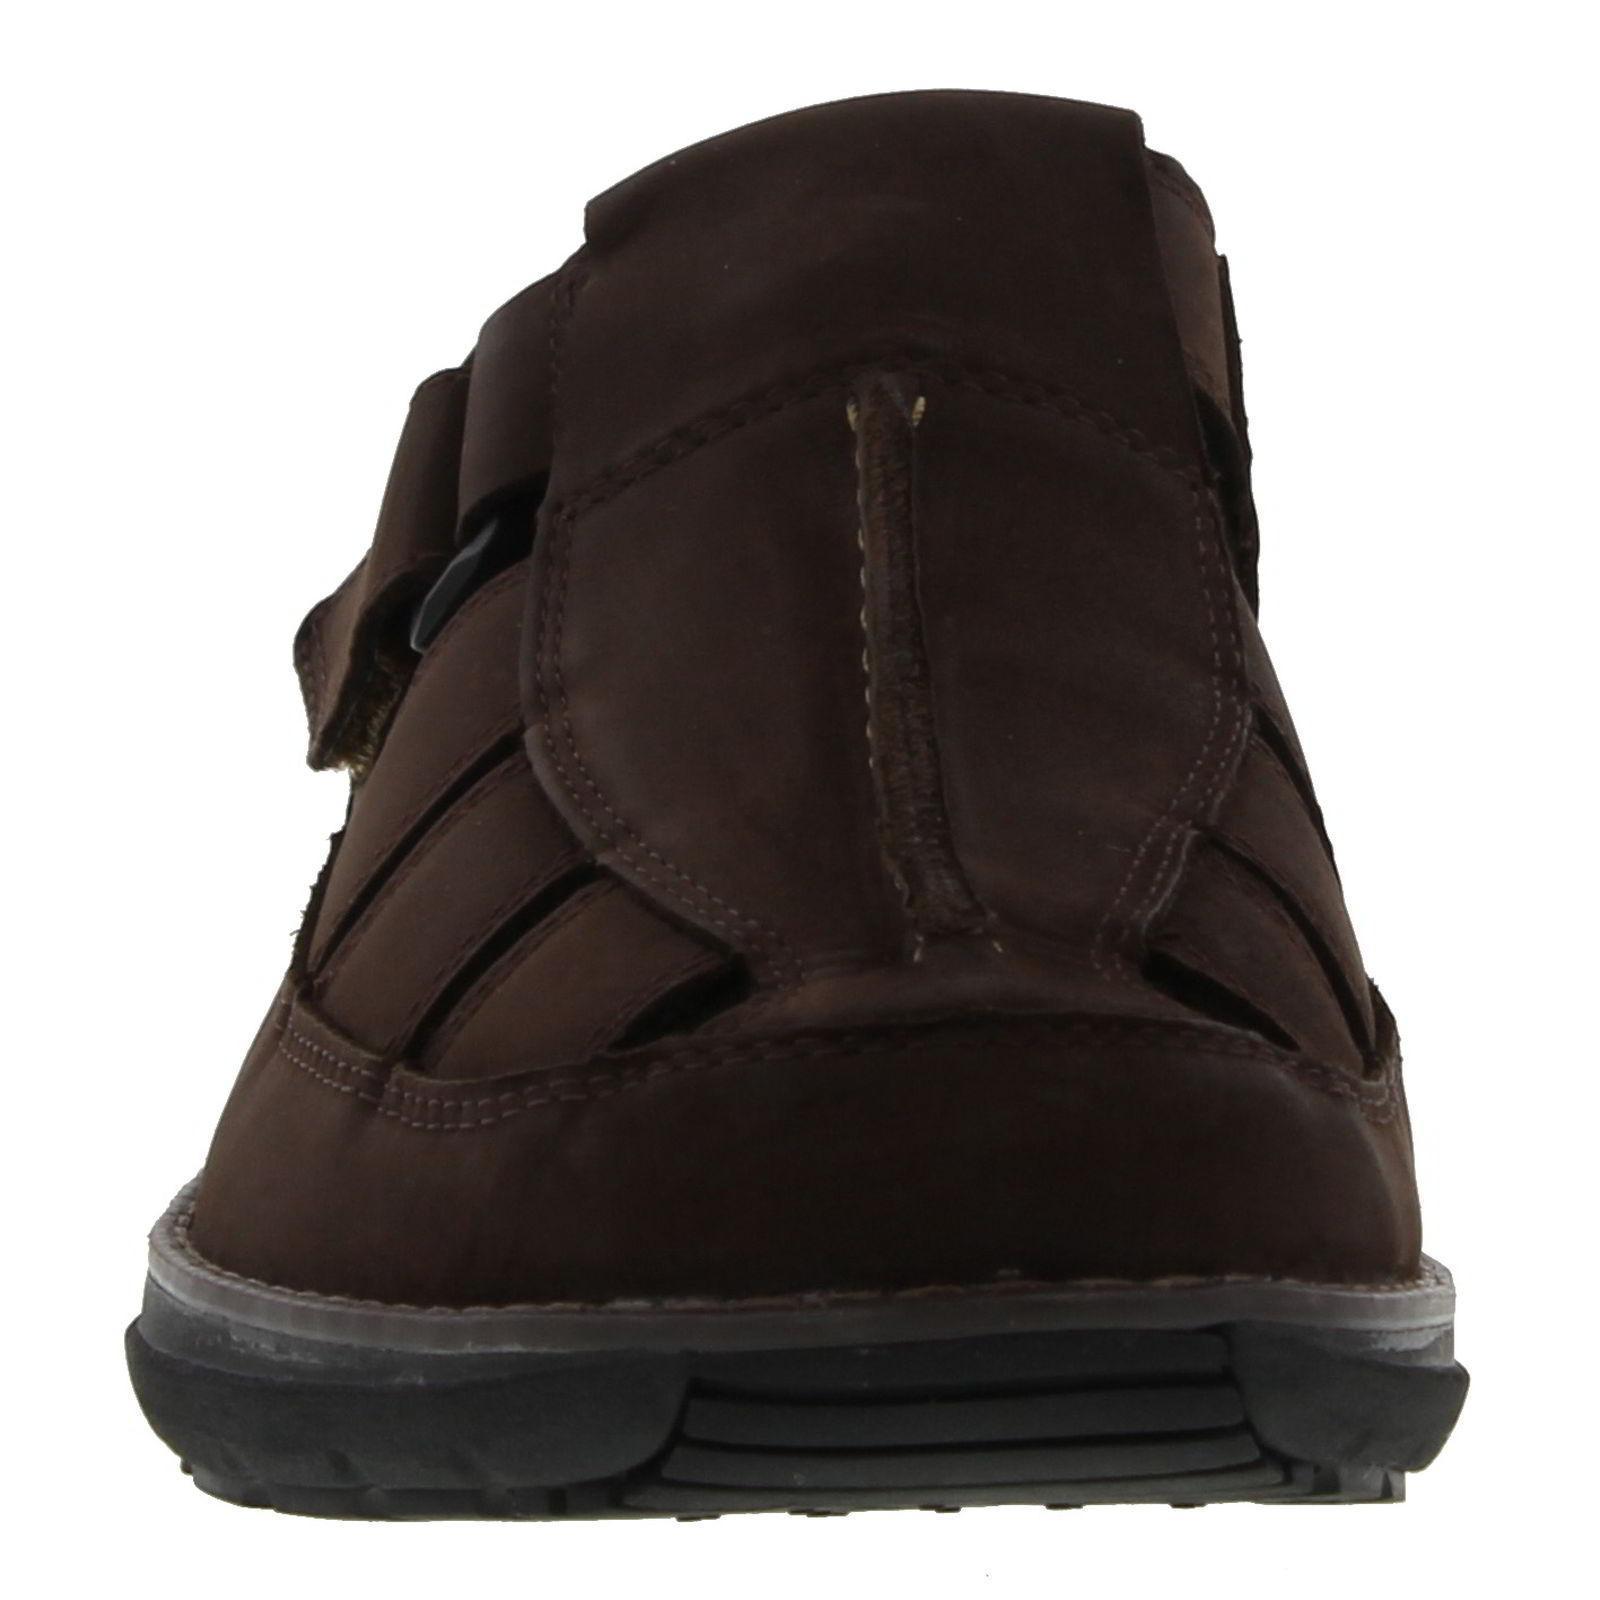 4fd0af37839f Timberland Barrett Park Fisherman Sandals in Brown for Men - Lyst